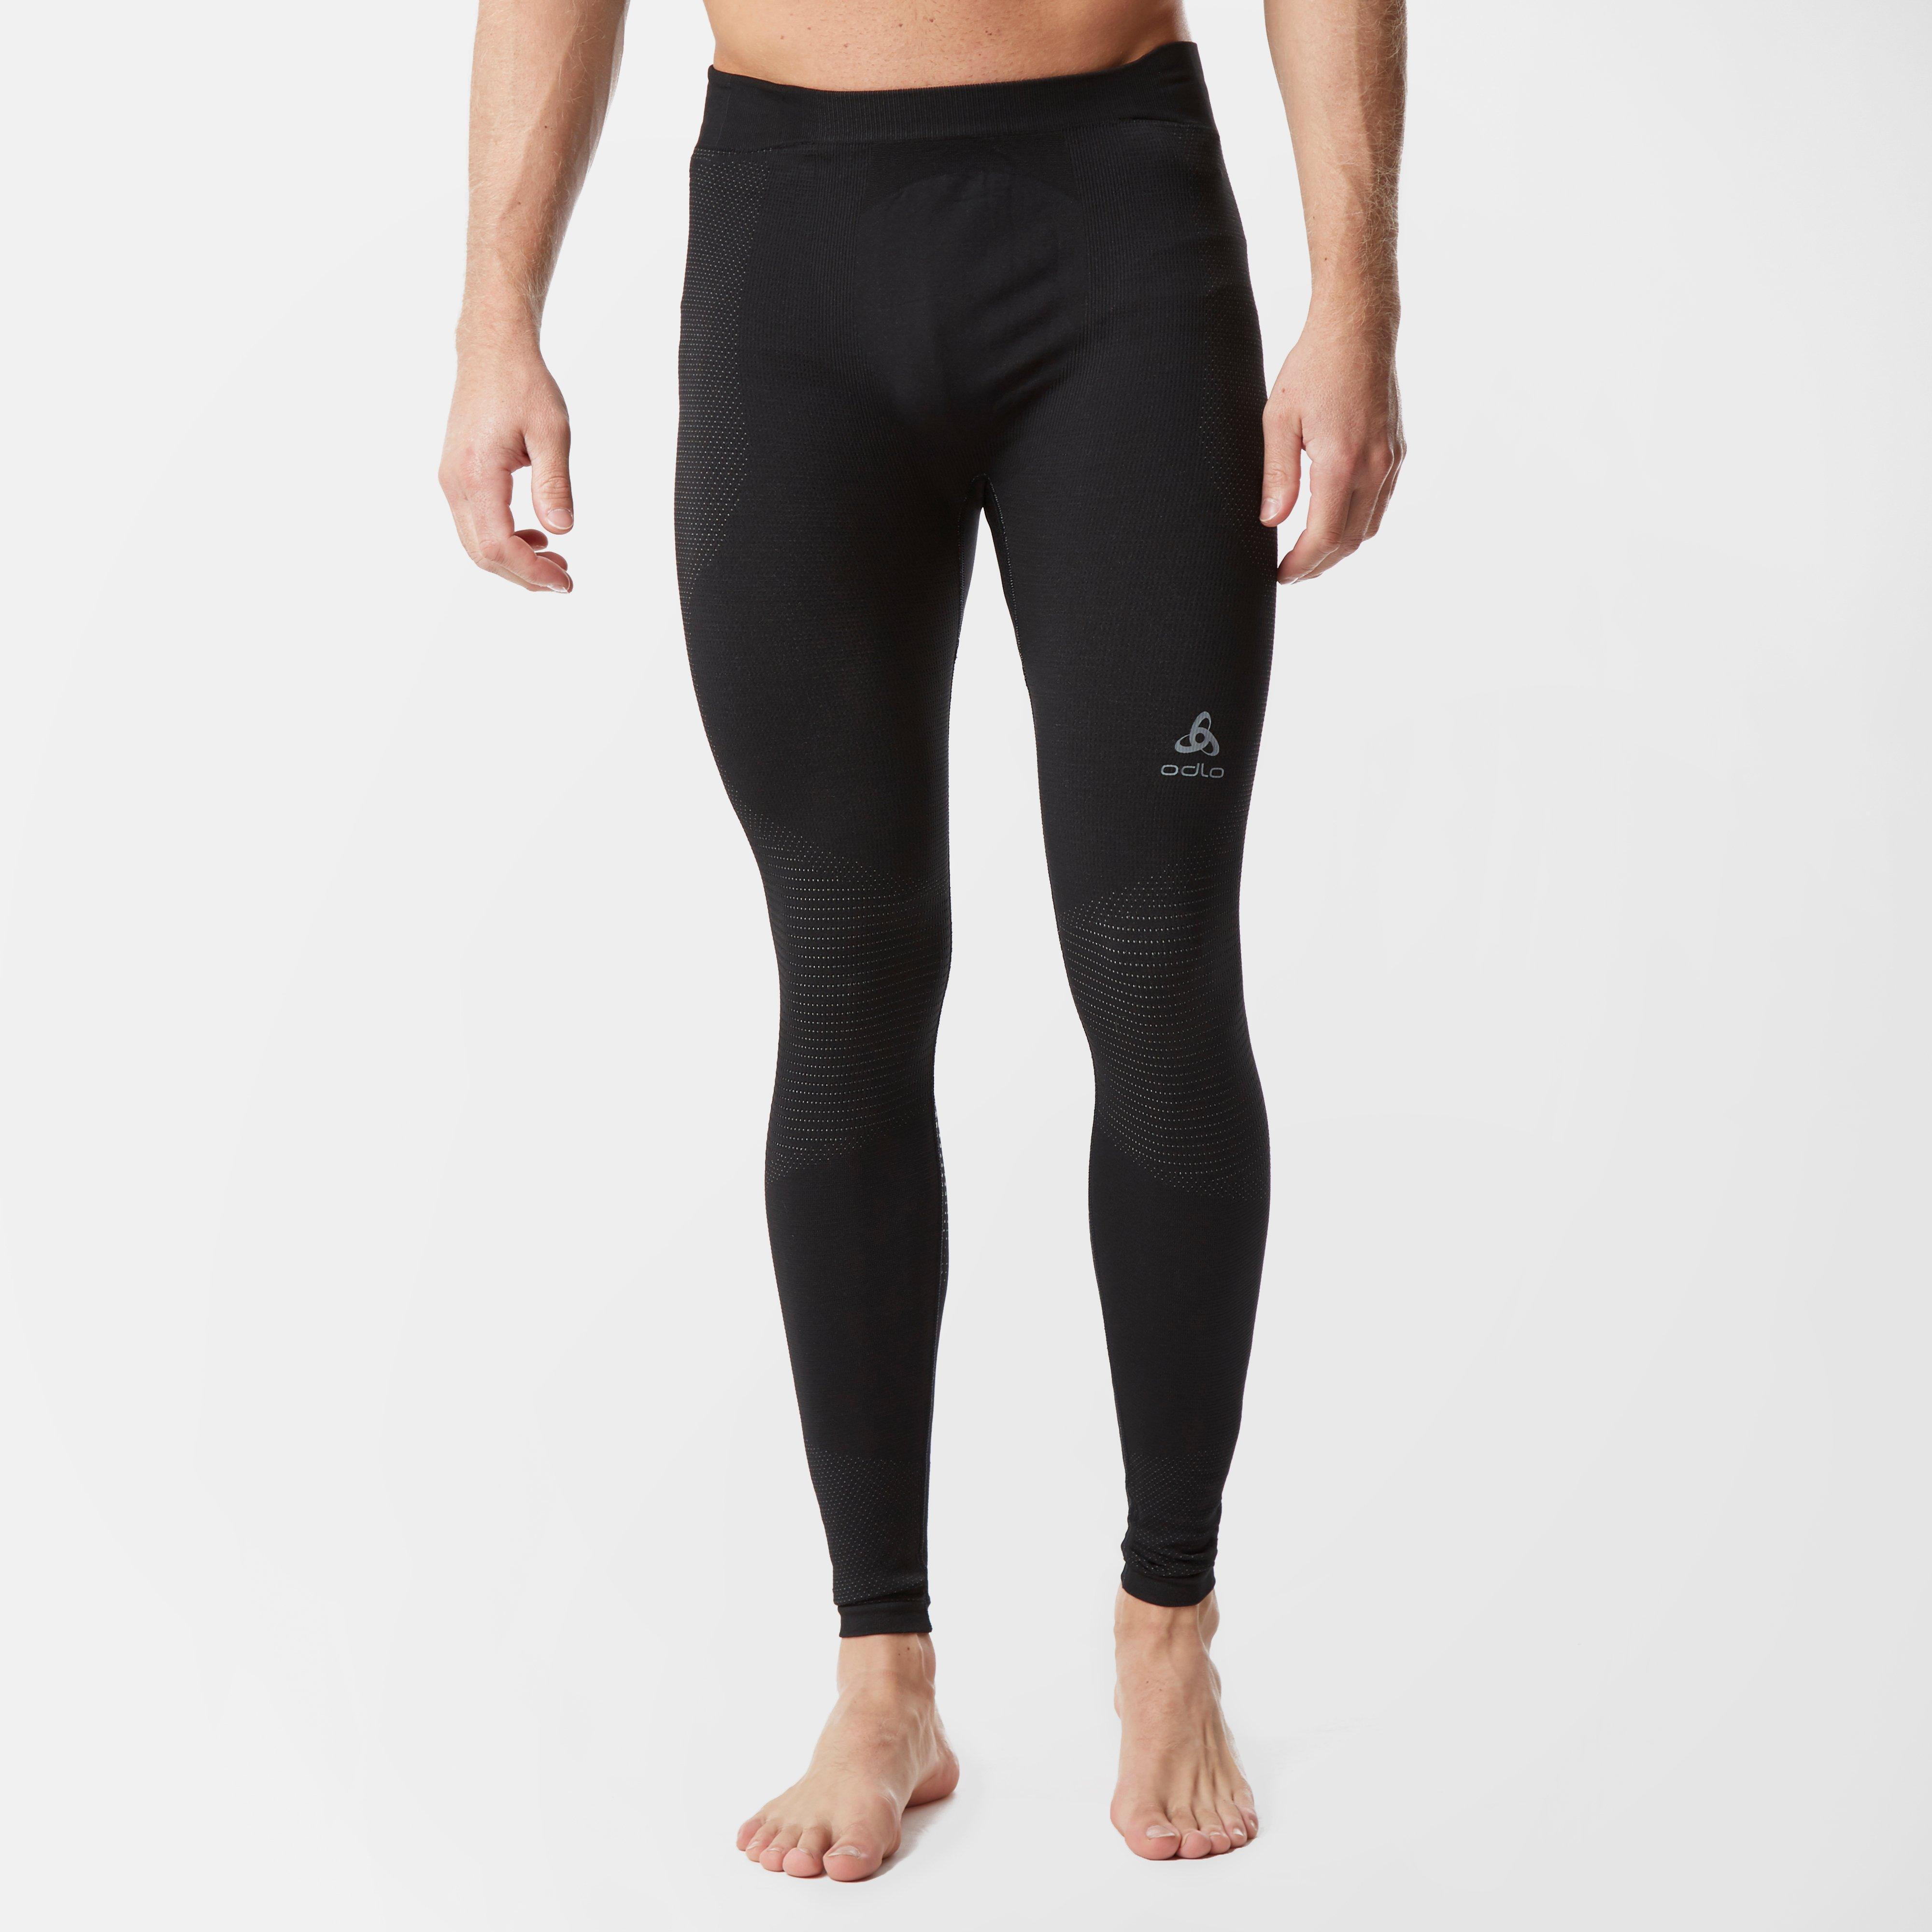 Odlo Odlo Mens SUW Performance Warm Pants - Black, Black